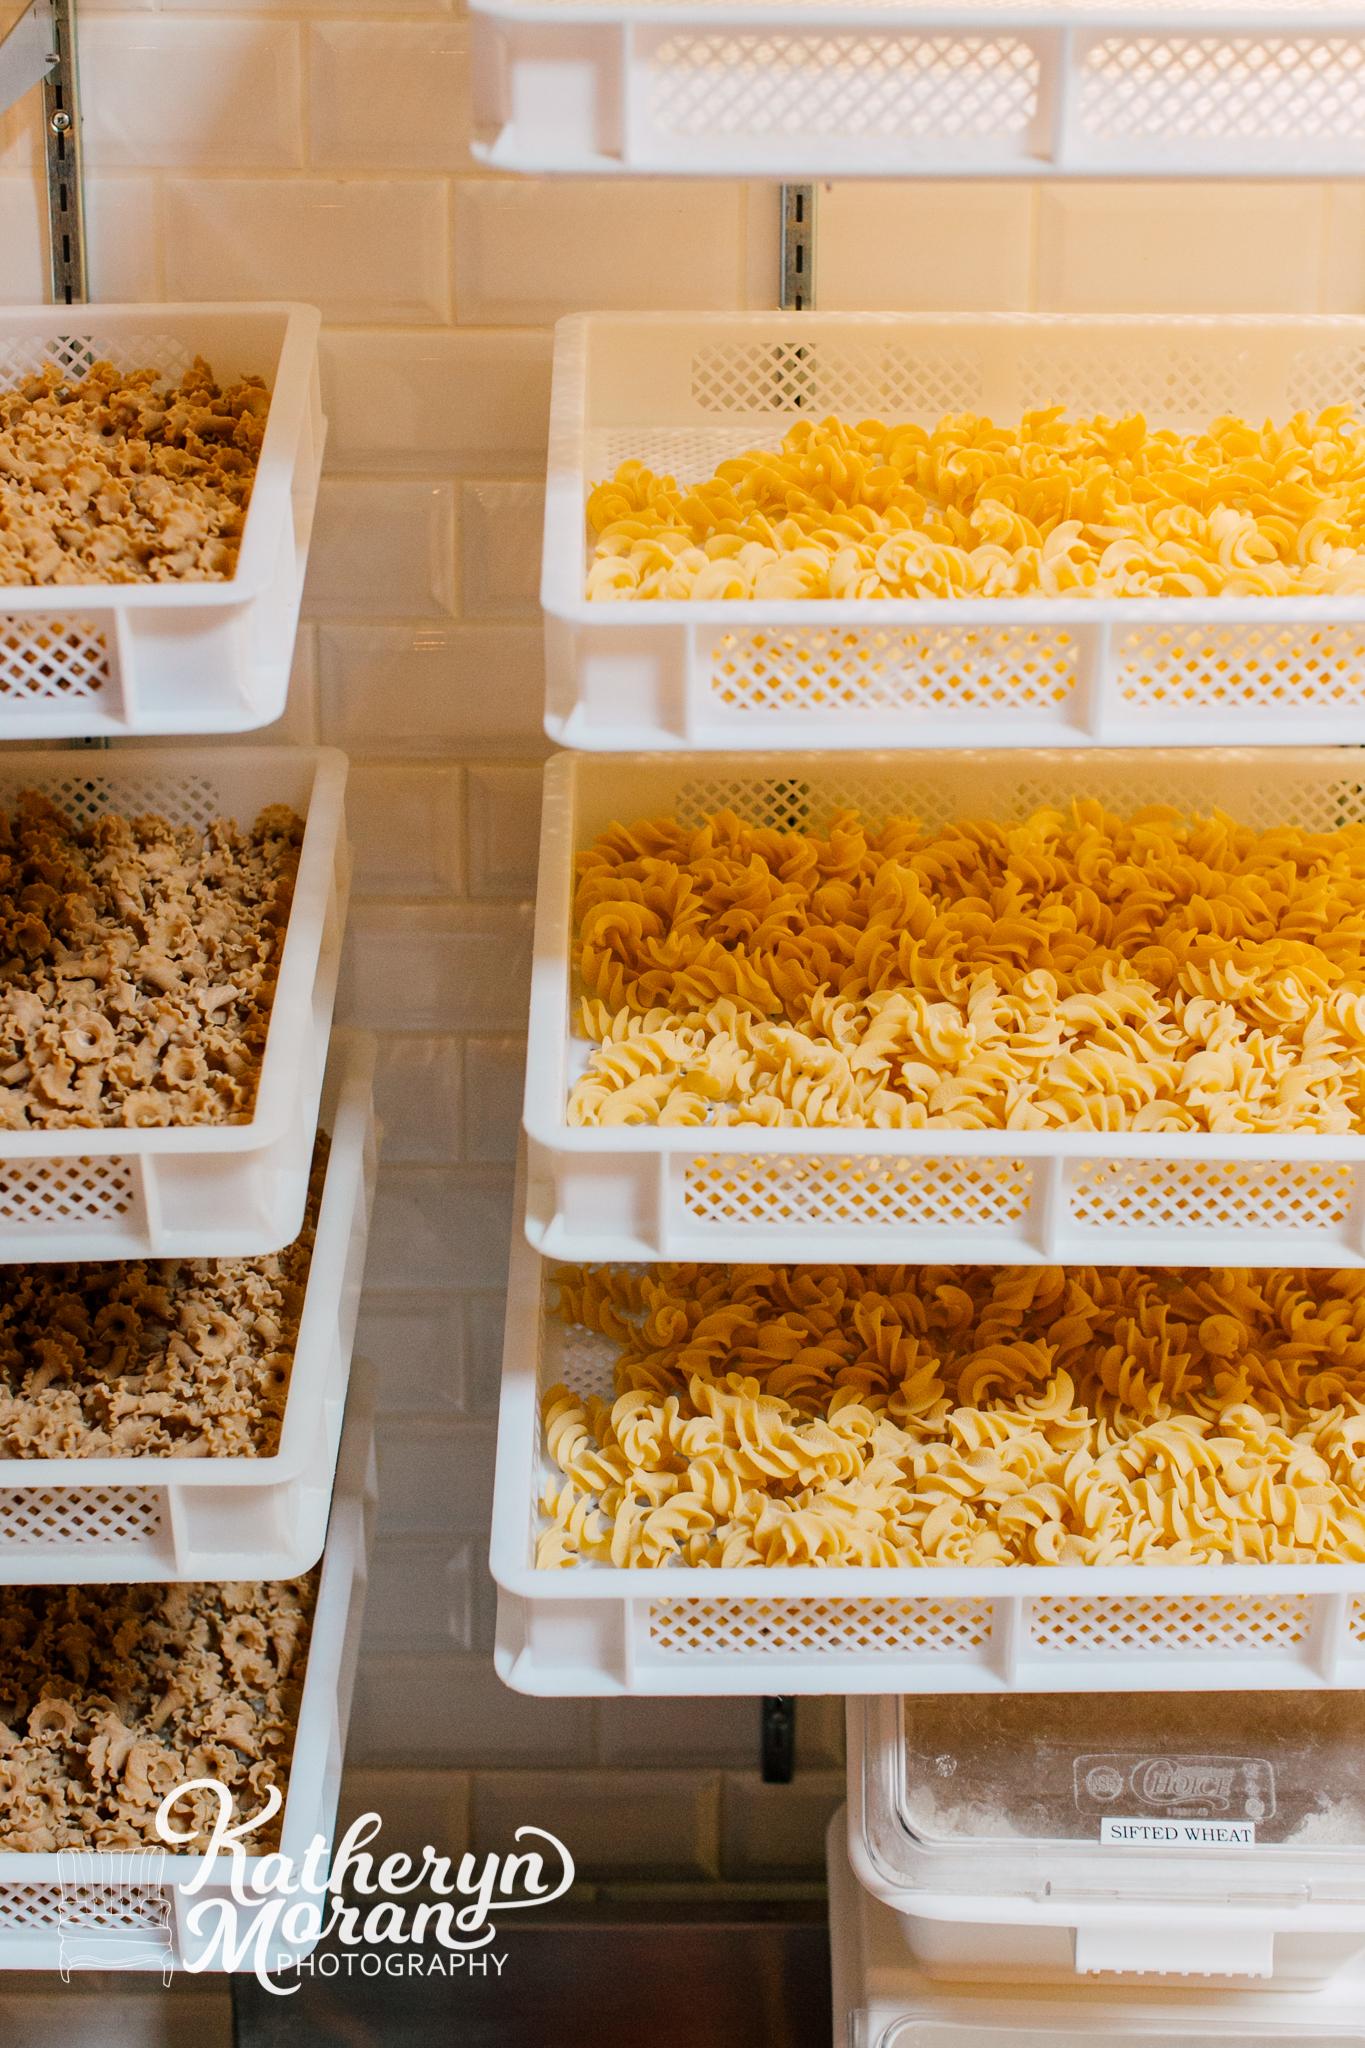 seattle-food-photographer-katheryn-moran-due-cucina-italiana-7.jpg